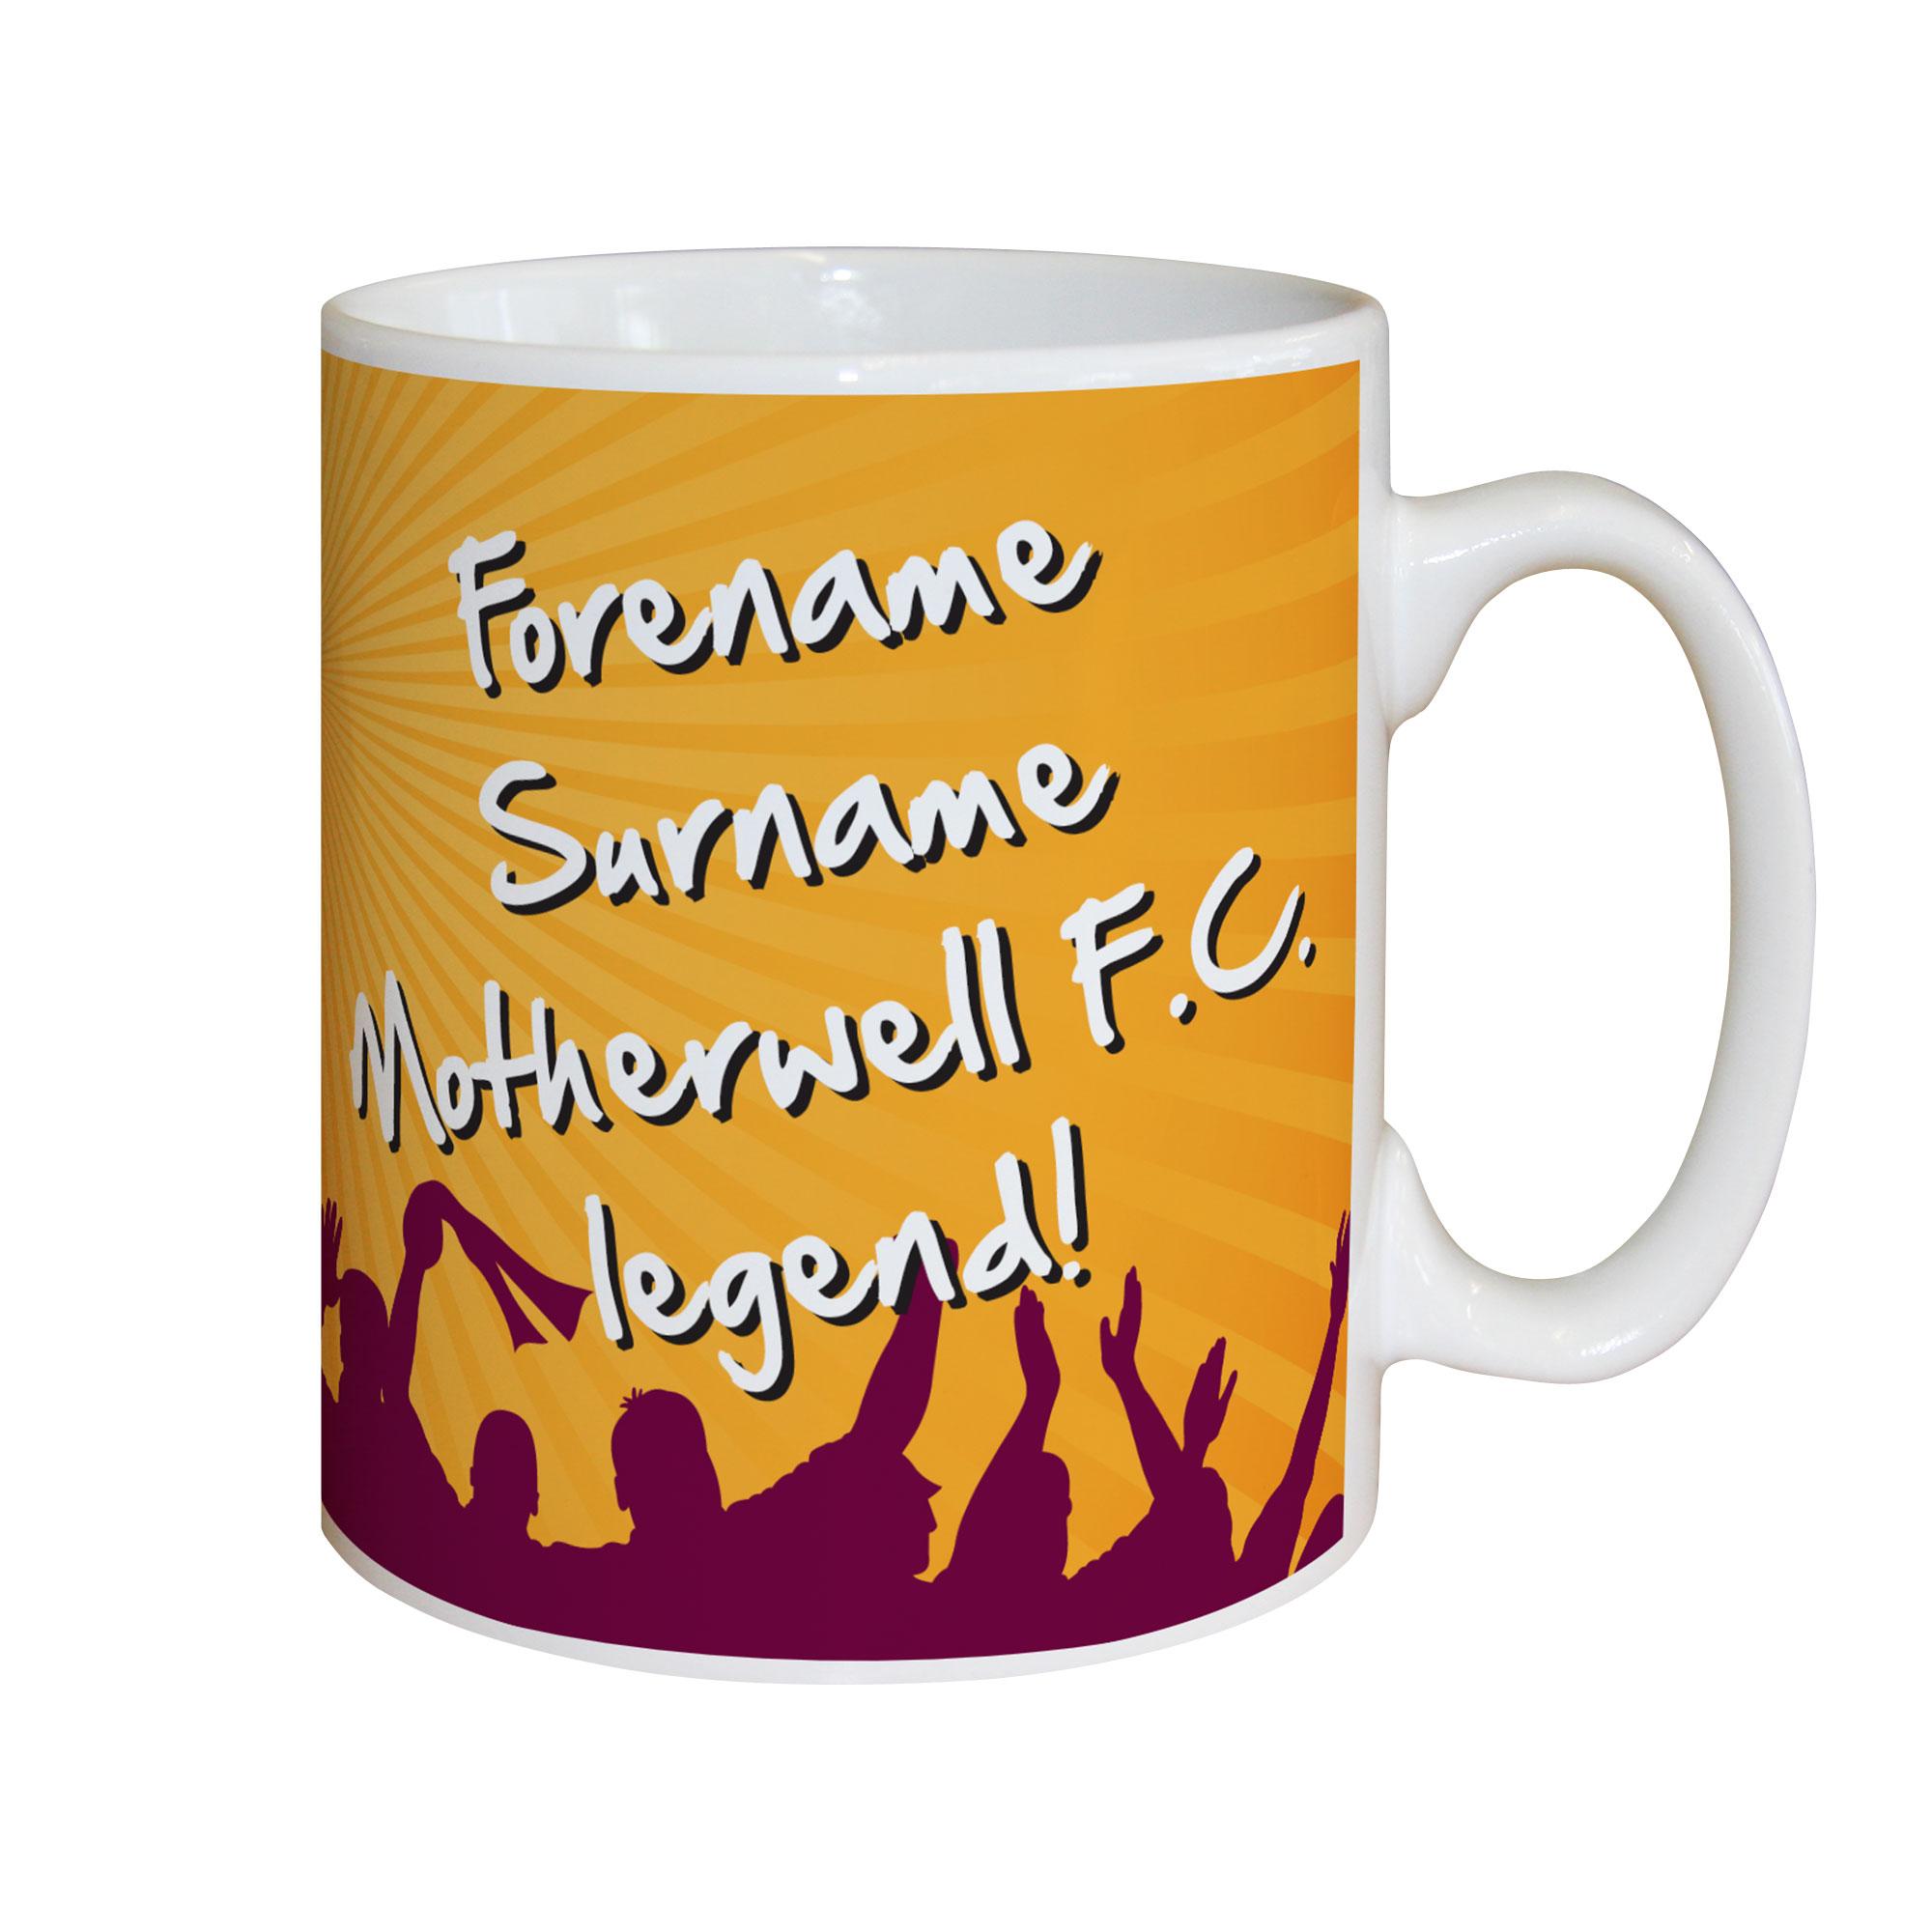 Motherwell FC Legend Mug